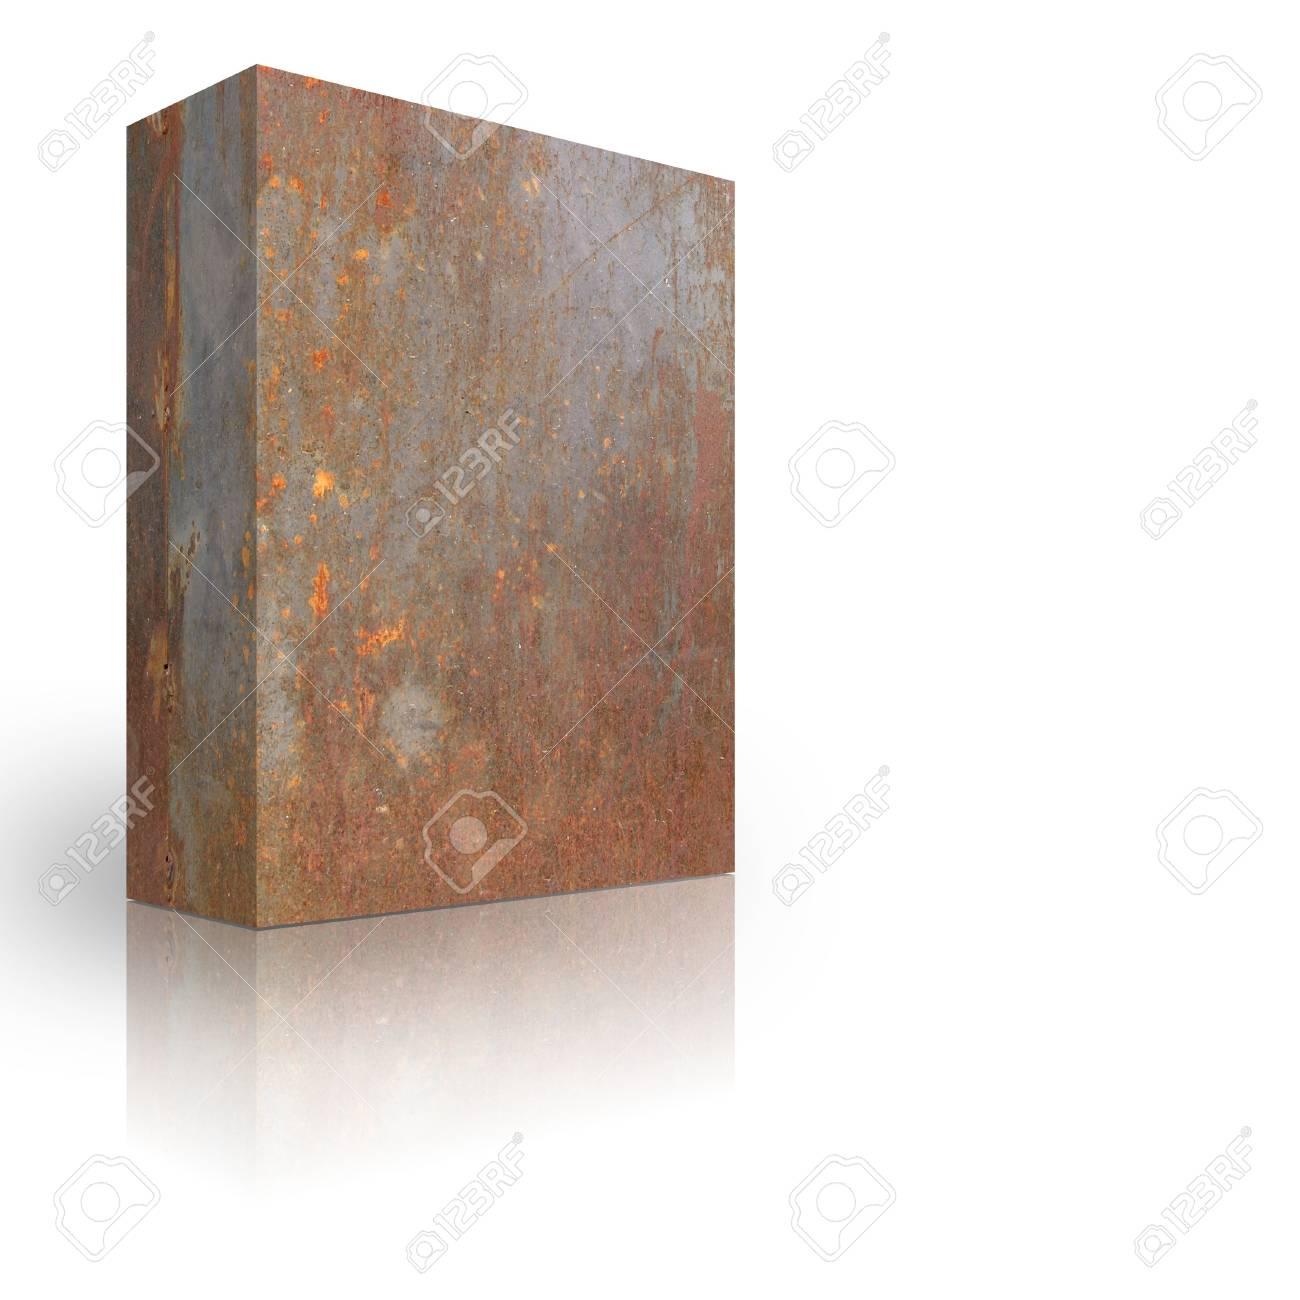 Metal box on a white background Stock Photo - 3627982